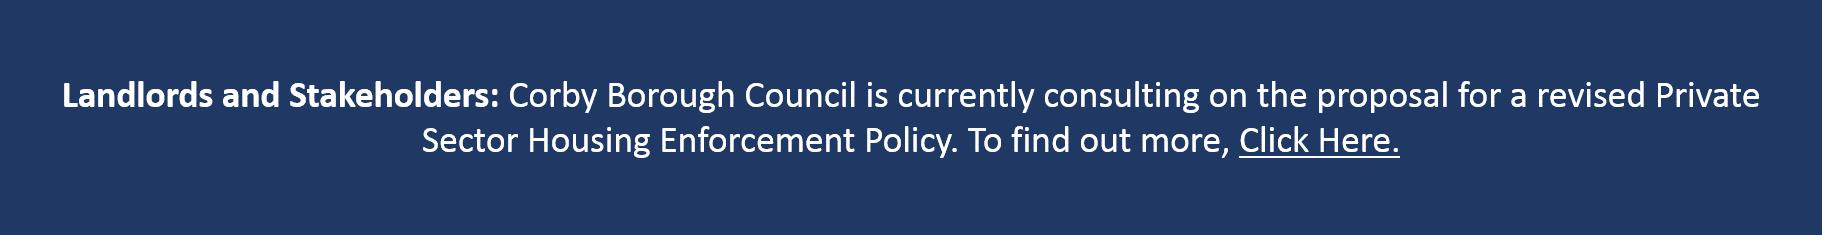 Enforcement Policy Banner